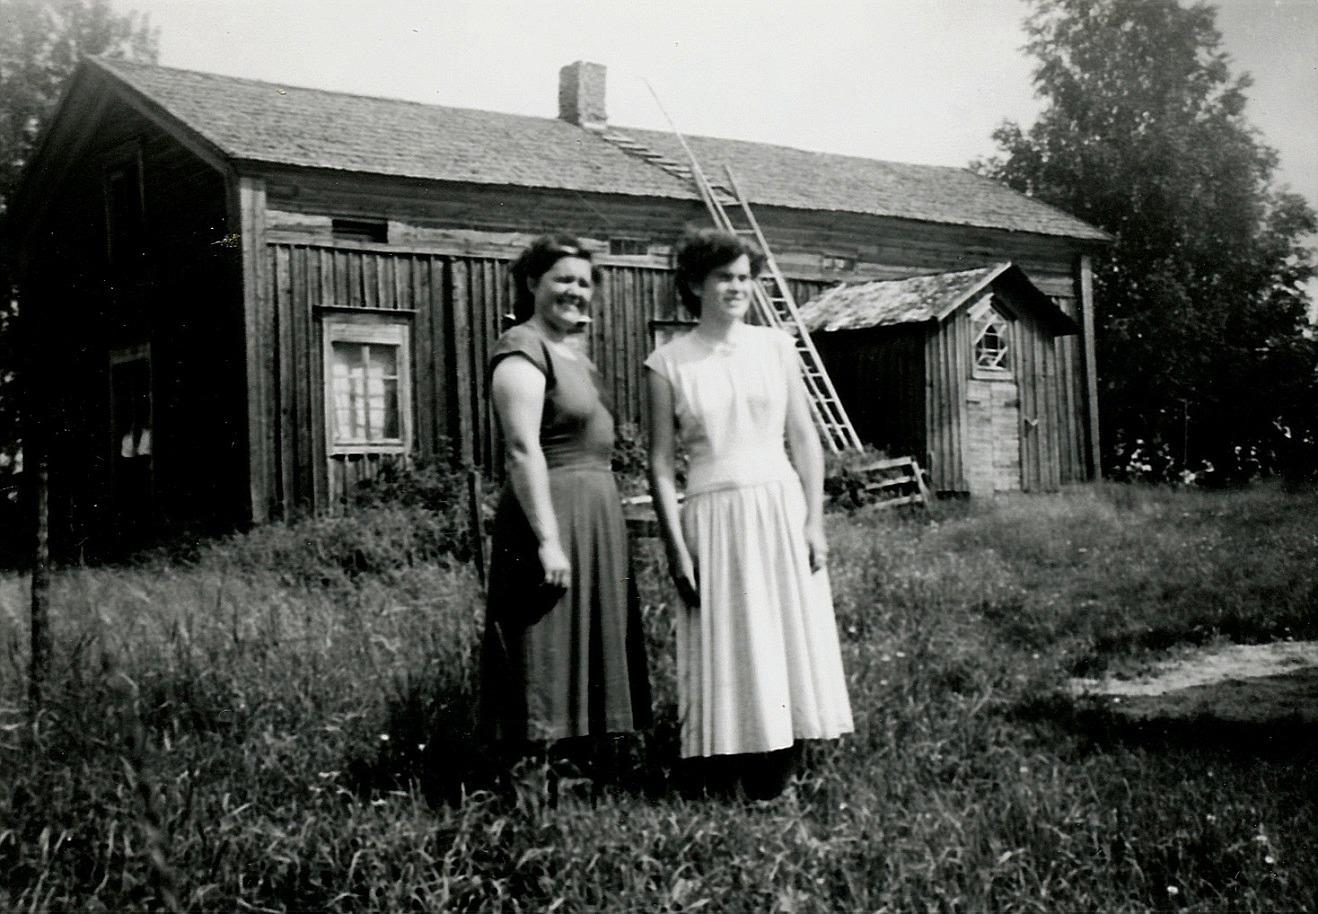 Anna Sonntag och dottern Inger f. 1943 på gården till Selmas barndomshem nära Klemets bron, alltså Halt-Eriks eller Kalleas-Eriks eller Erik Asplunds gård som han hette på riktigt. Klemets bron ligger precis bakom gården.